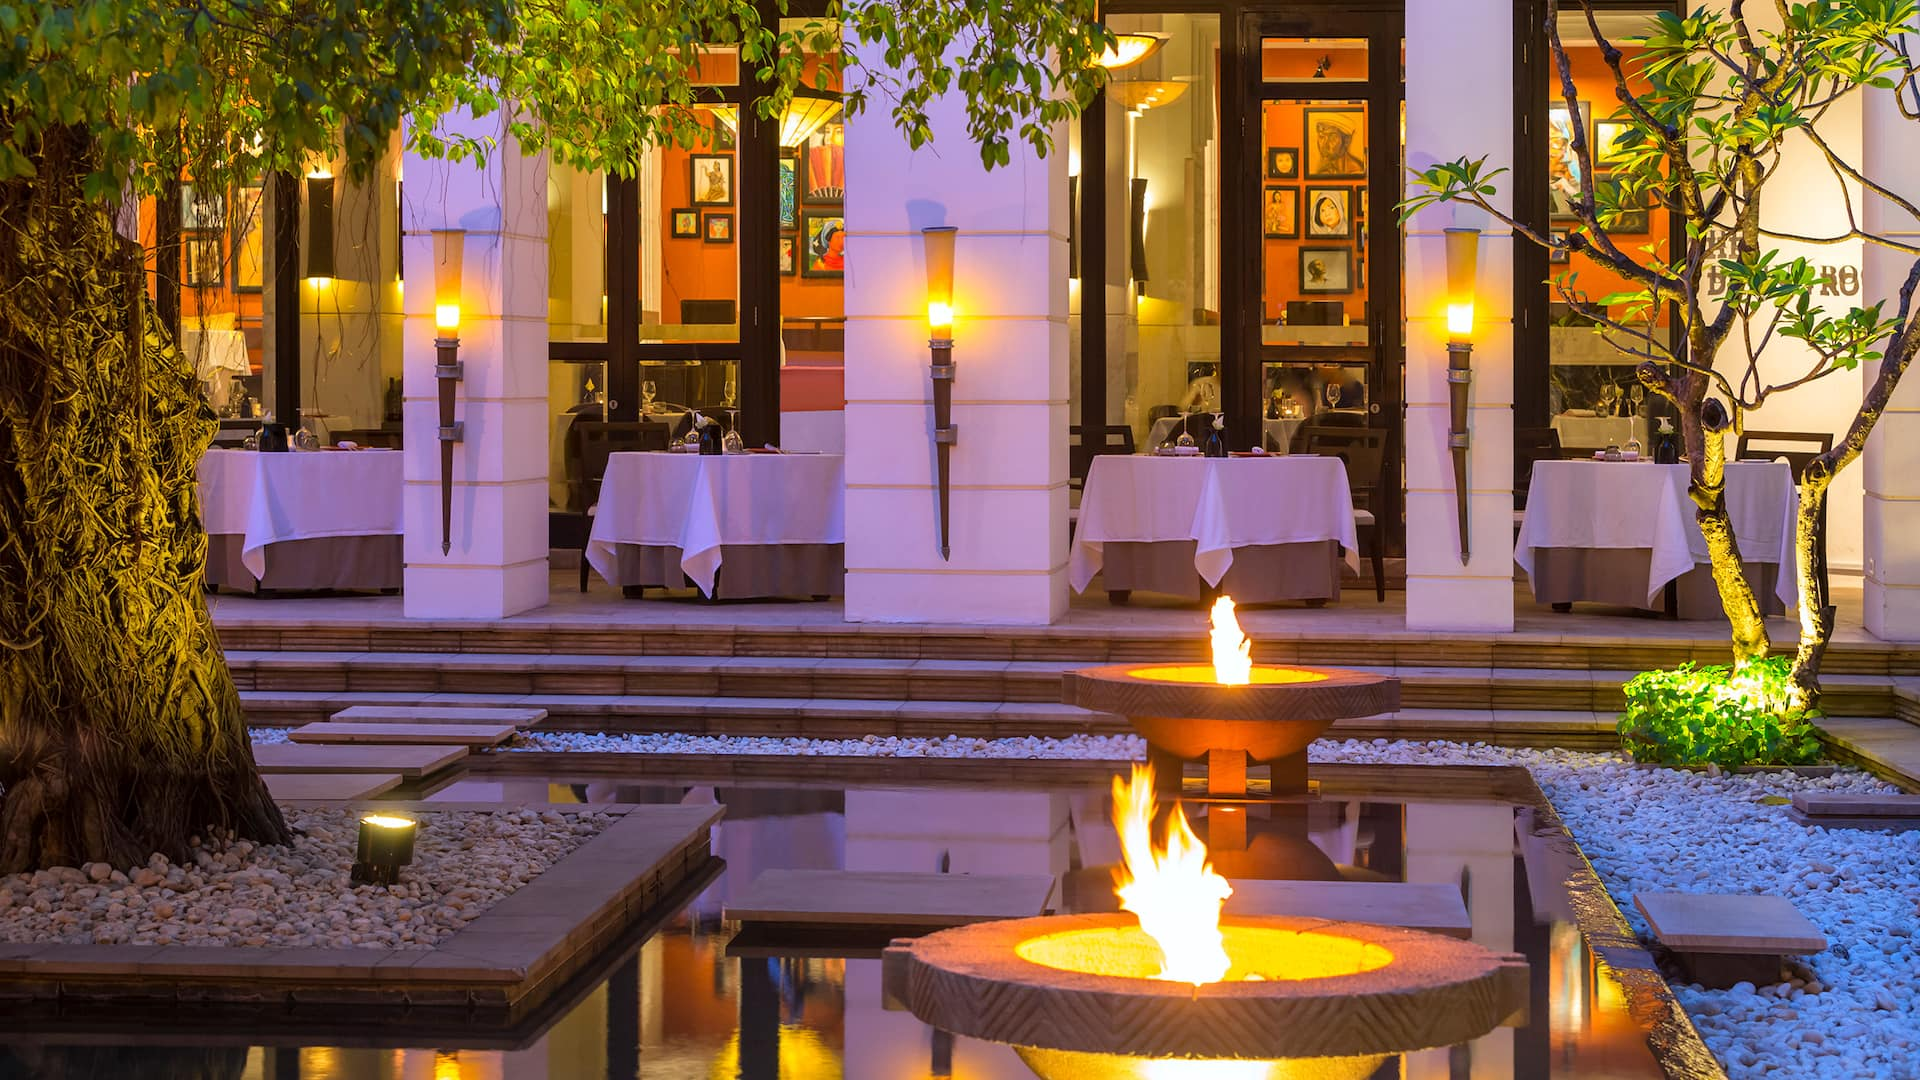 Best Restaurants in Siem Reap dining room courtyard